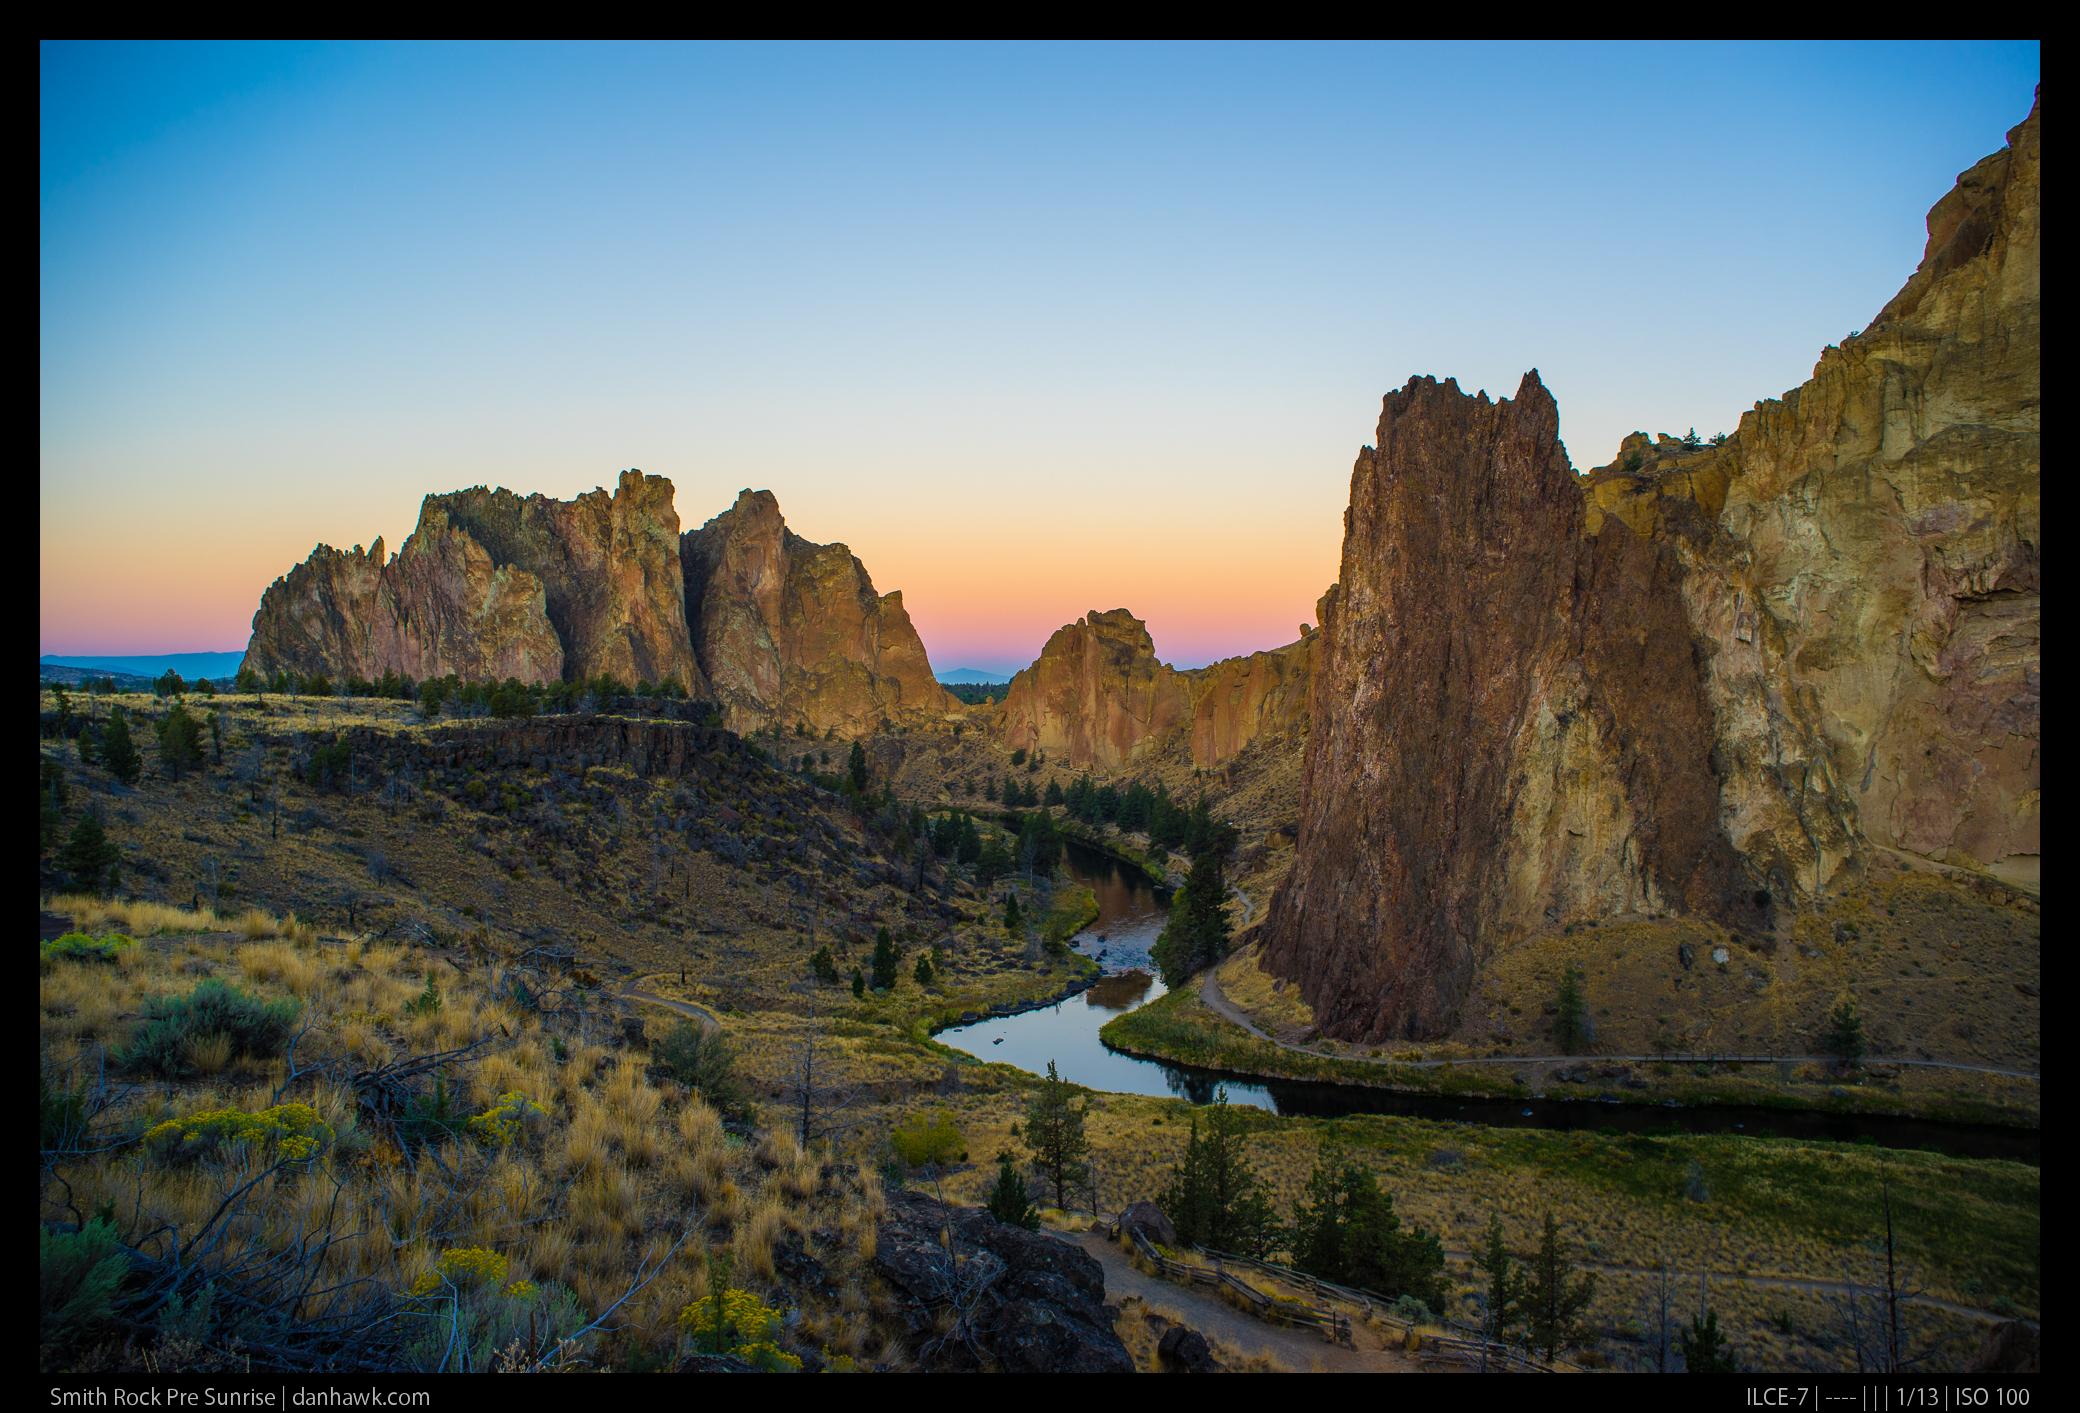 Smith Rock Pre Sunrise